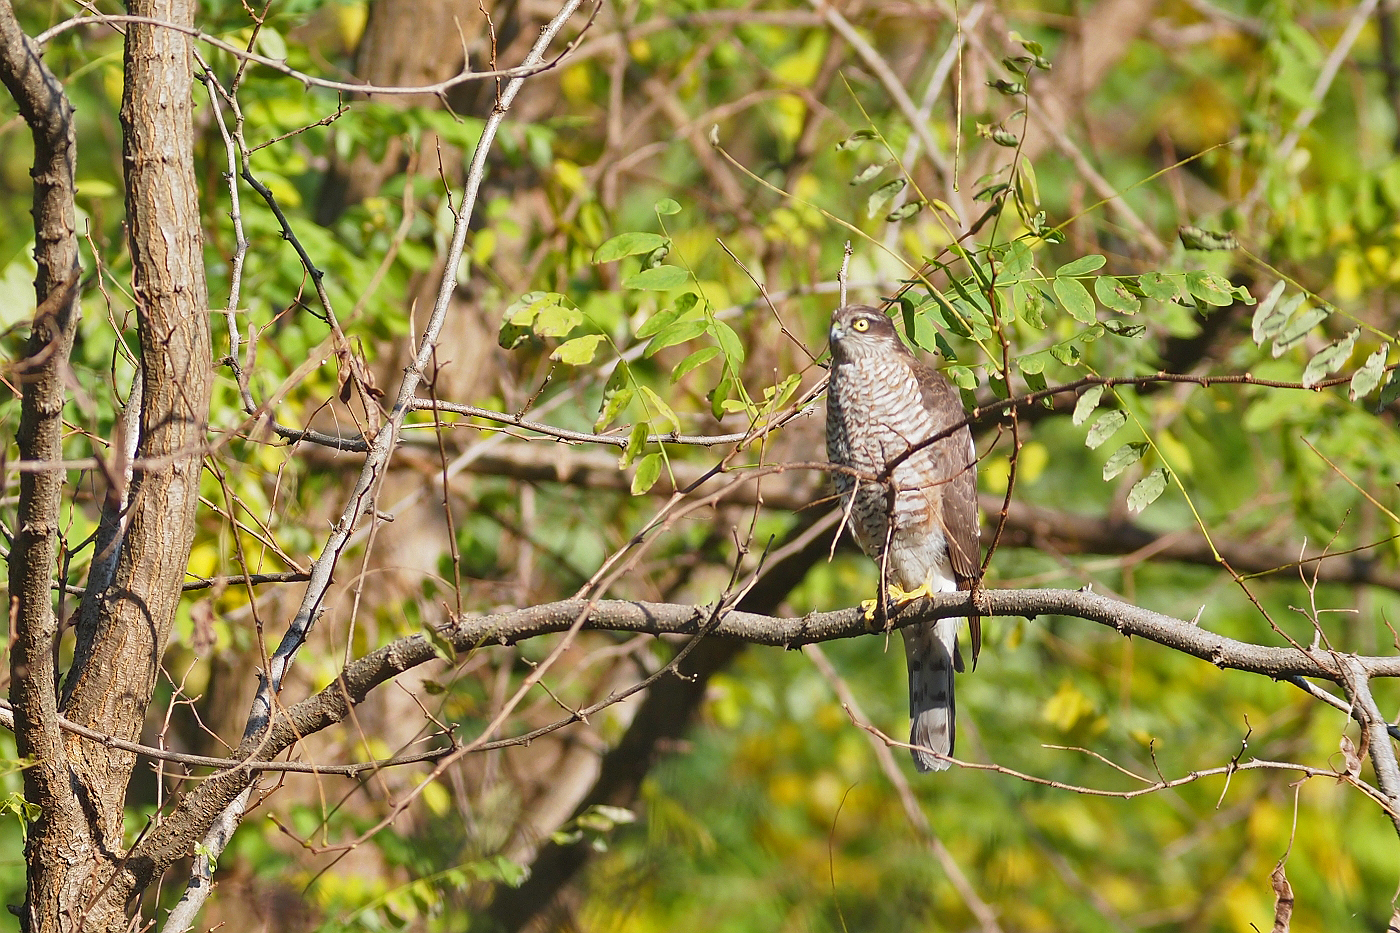 BORG71FLで撮影した野鳥・ハイタカの写真画像